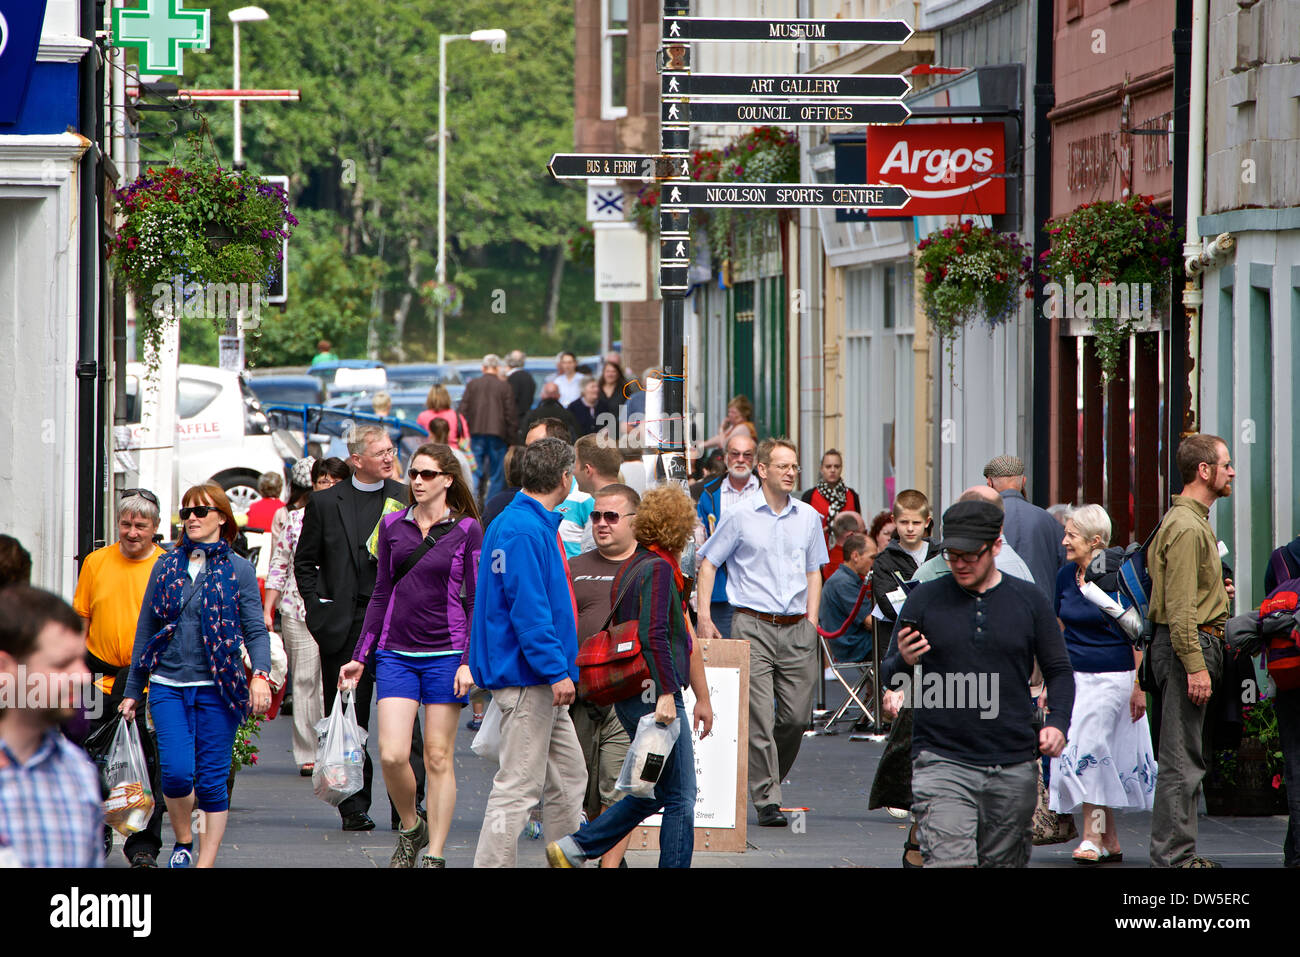 Stornoway town centre - Stock Image